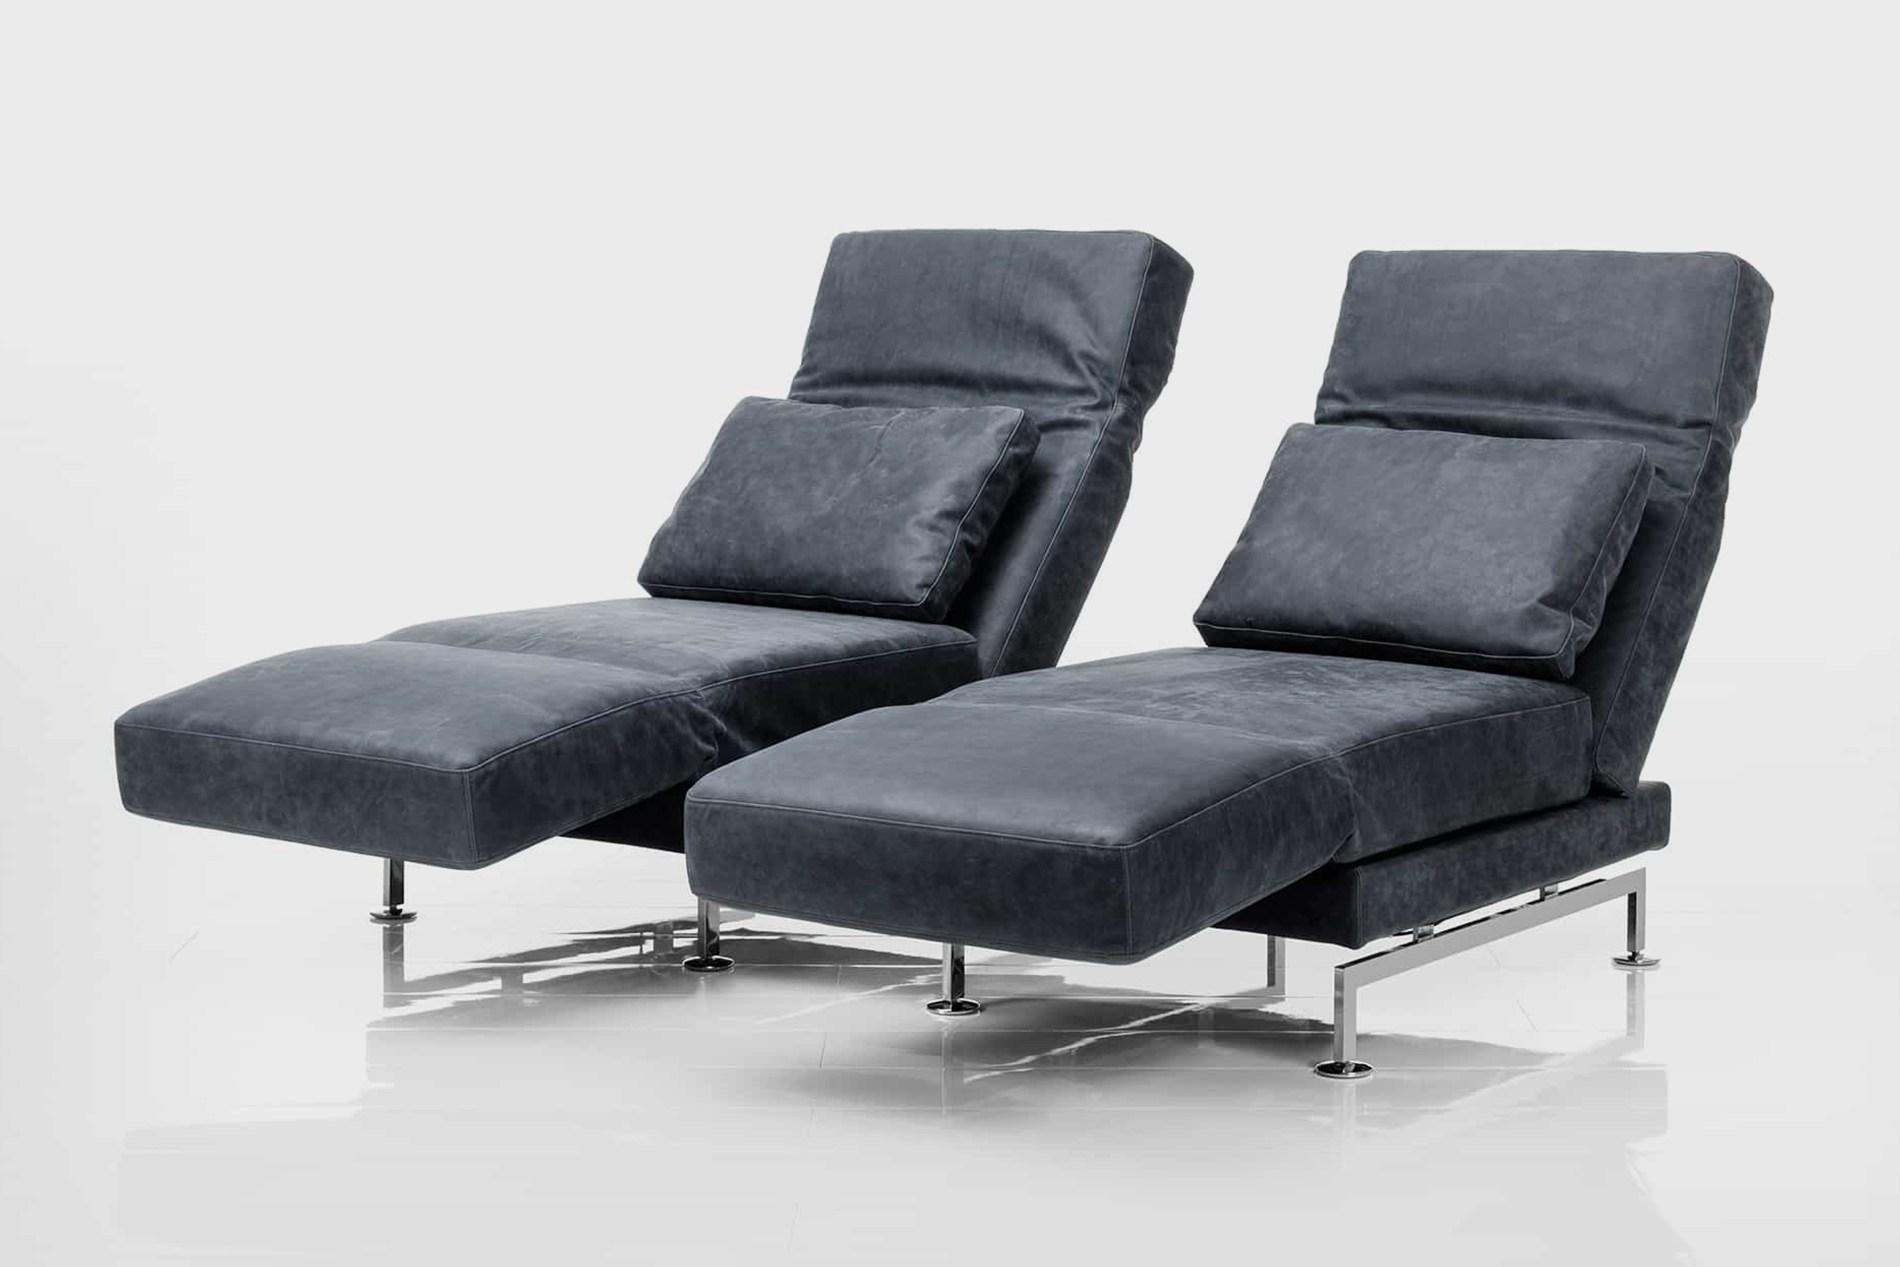 Sessel Moule von Brühl der multifunktionale Schlafsessel